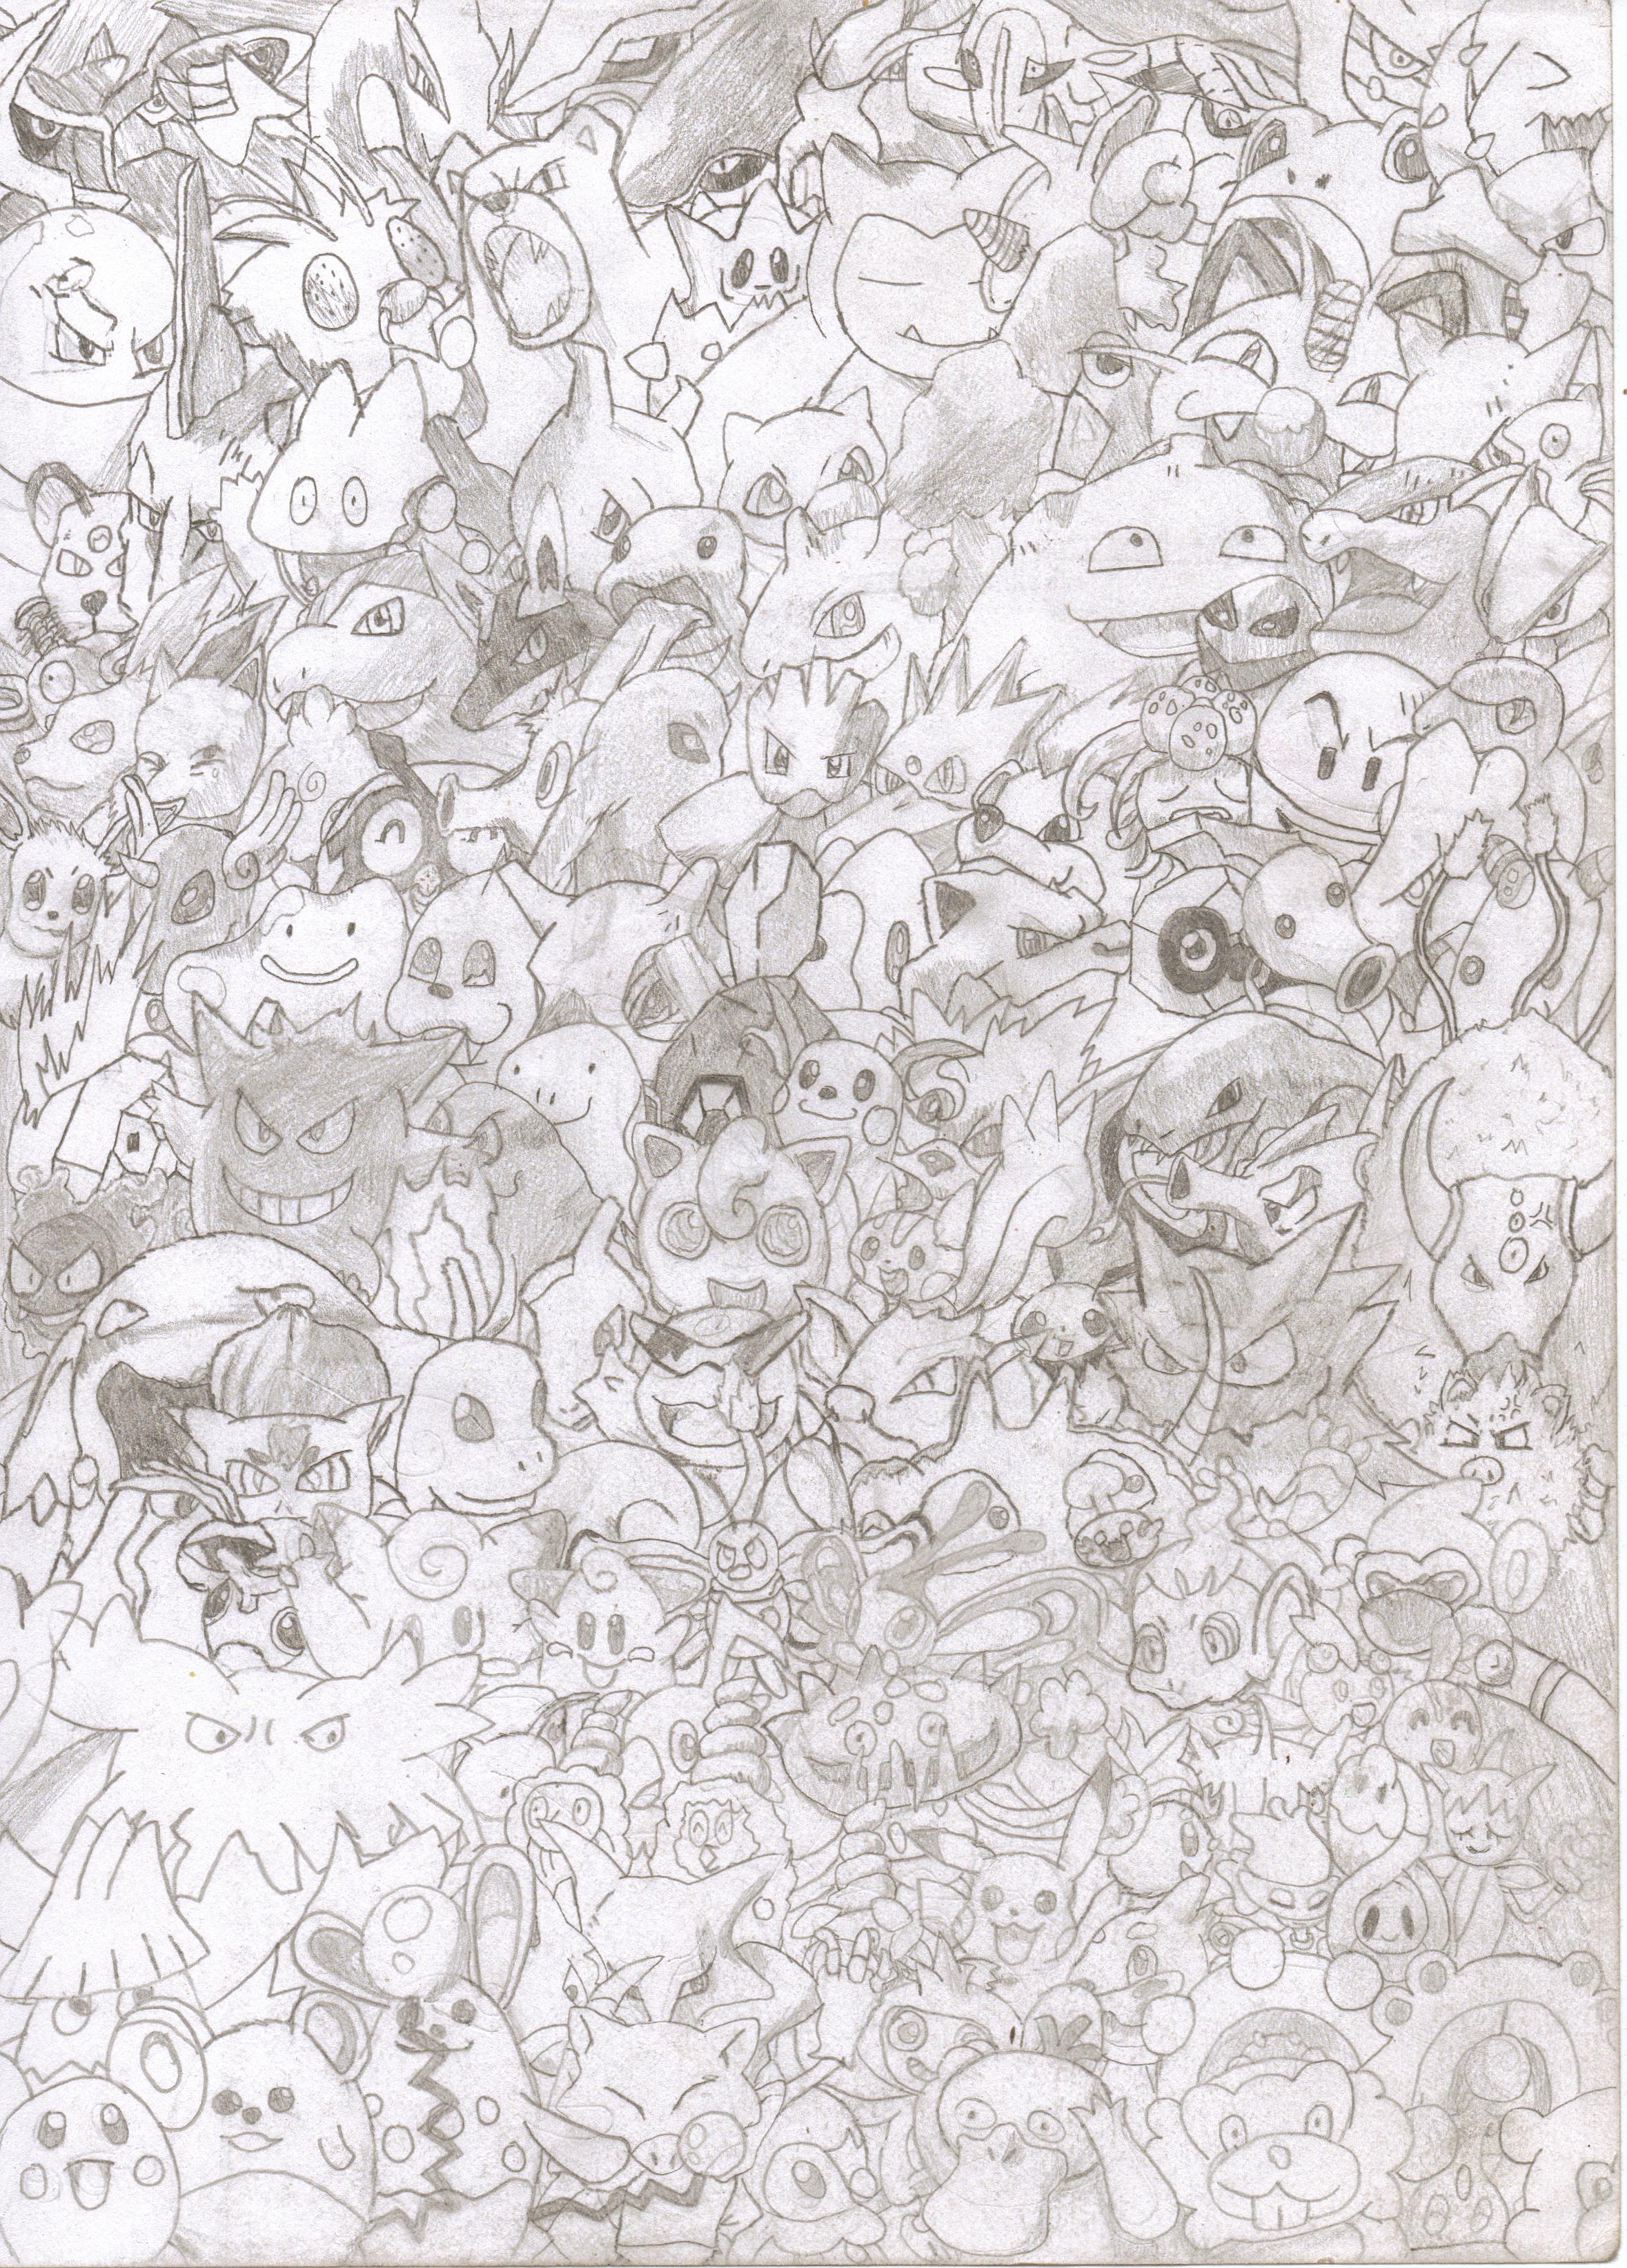 Pokemons!